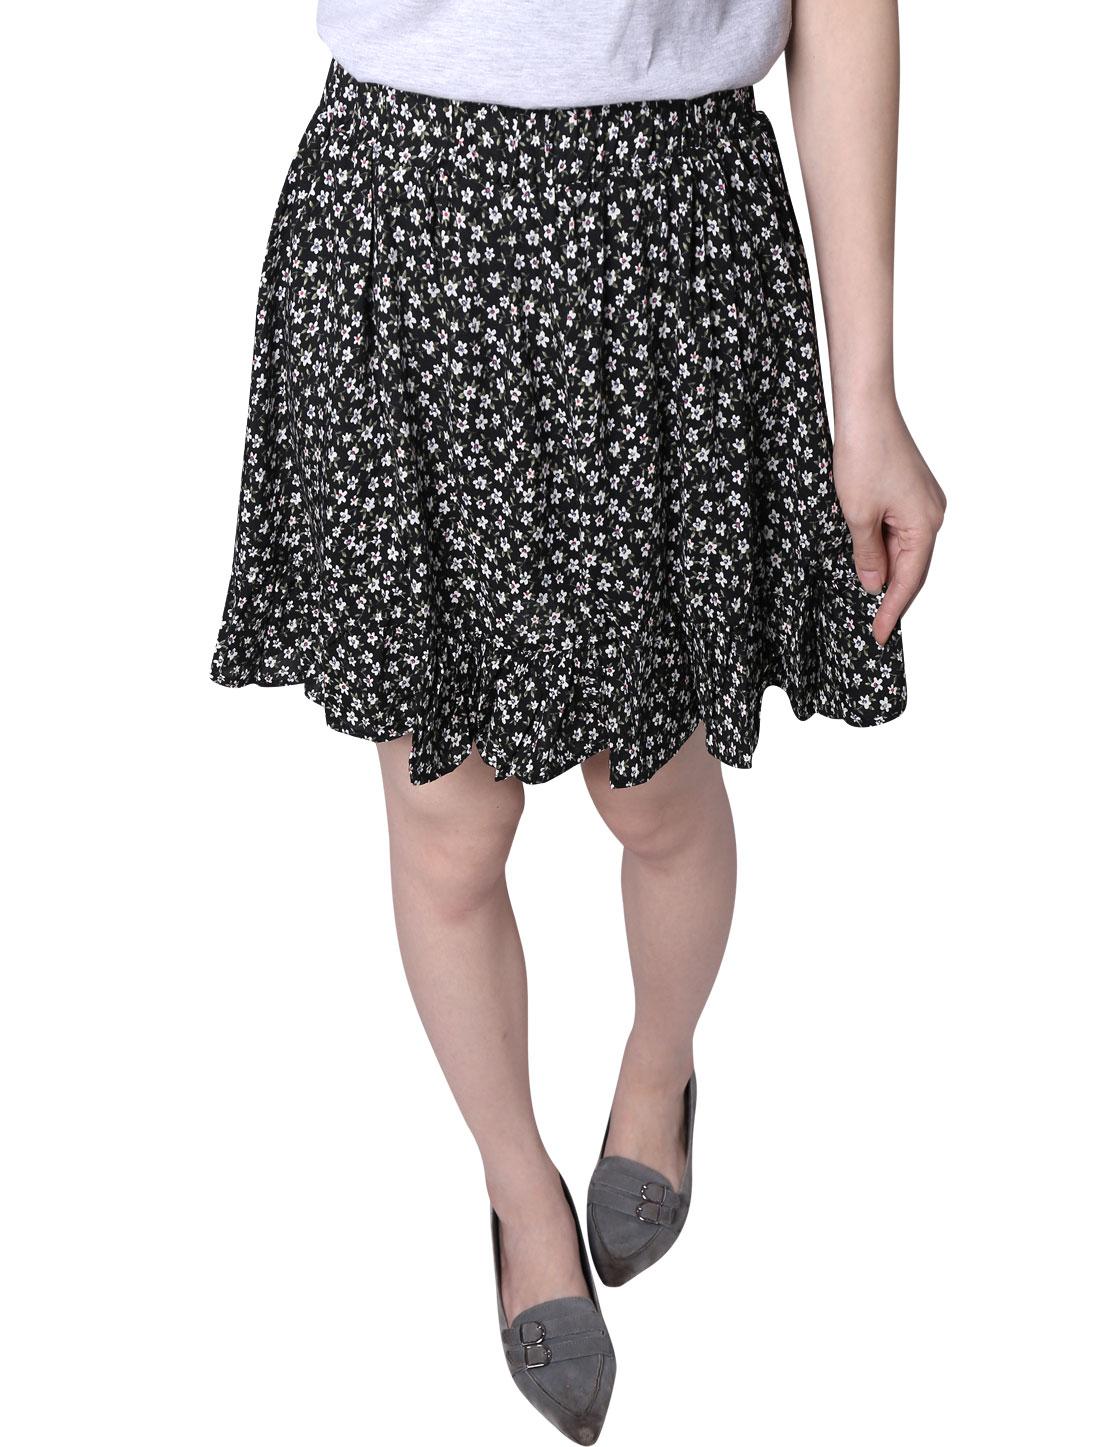 Ladies Floral Prints Stretchy Waist Fully Lined A Line Skort Black XS